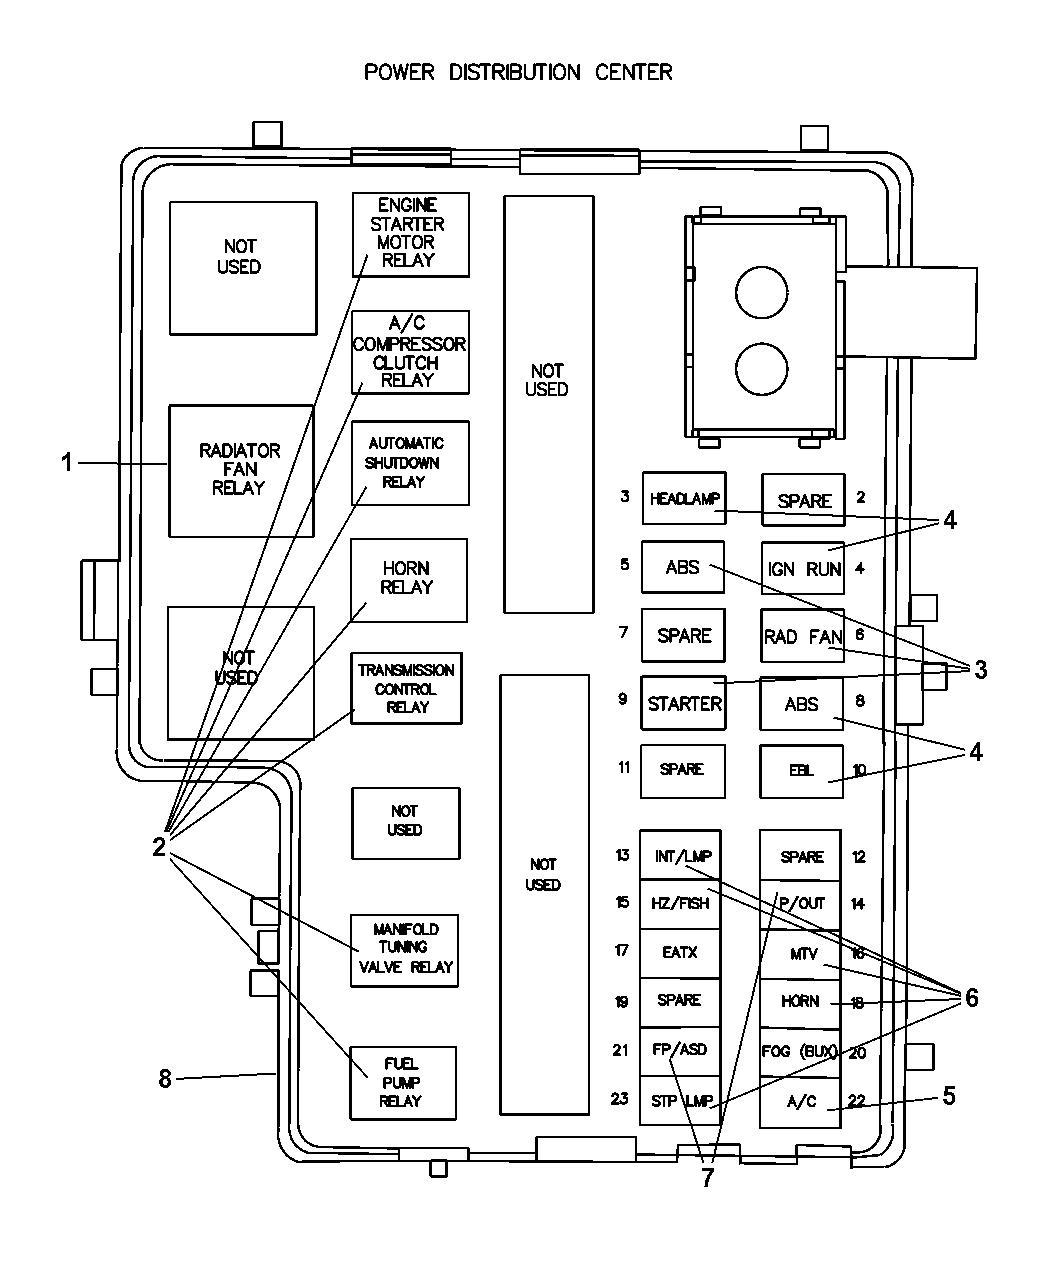 2003 Dodge Neon Se L4 20 Cruise Control System Diagram